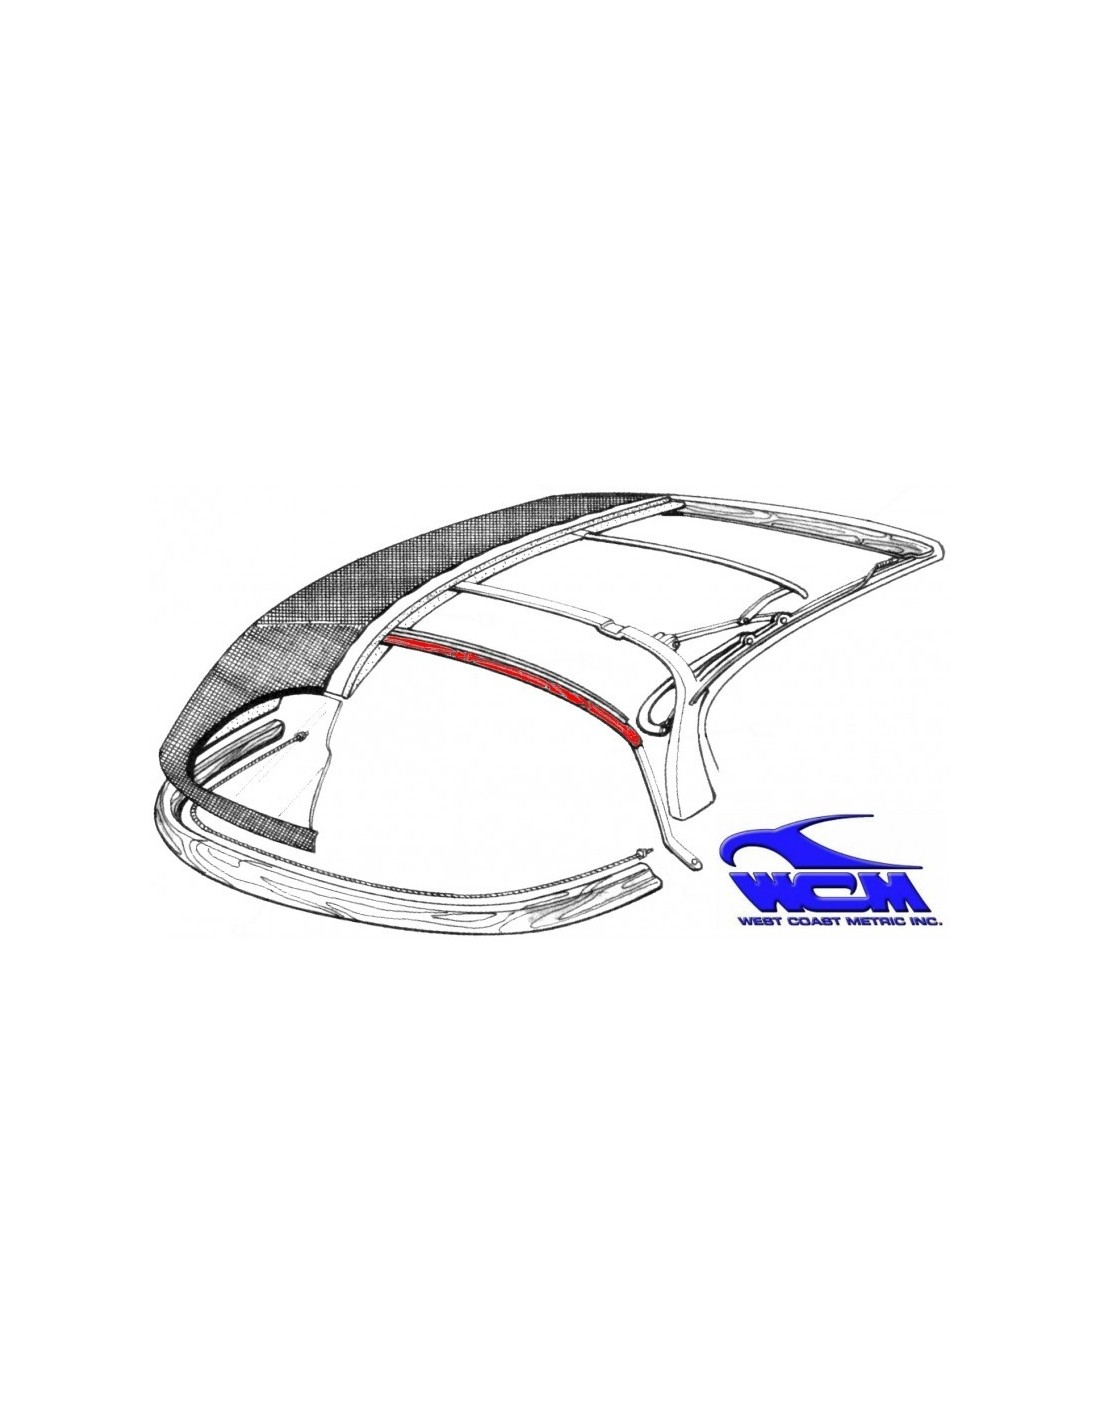 Traverse Centrale Armature Capote Karmann Ghia Cabriolet 69 74